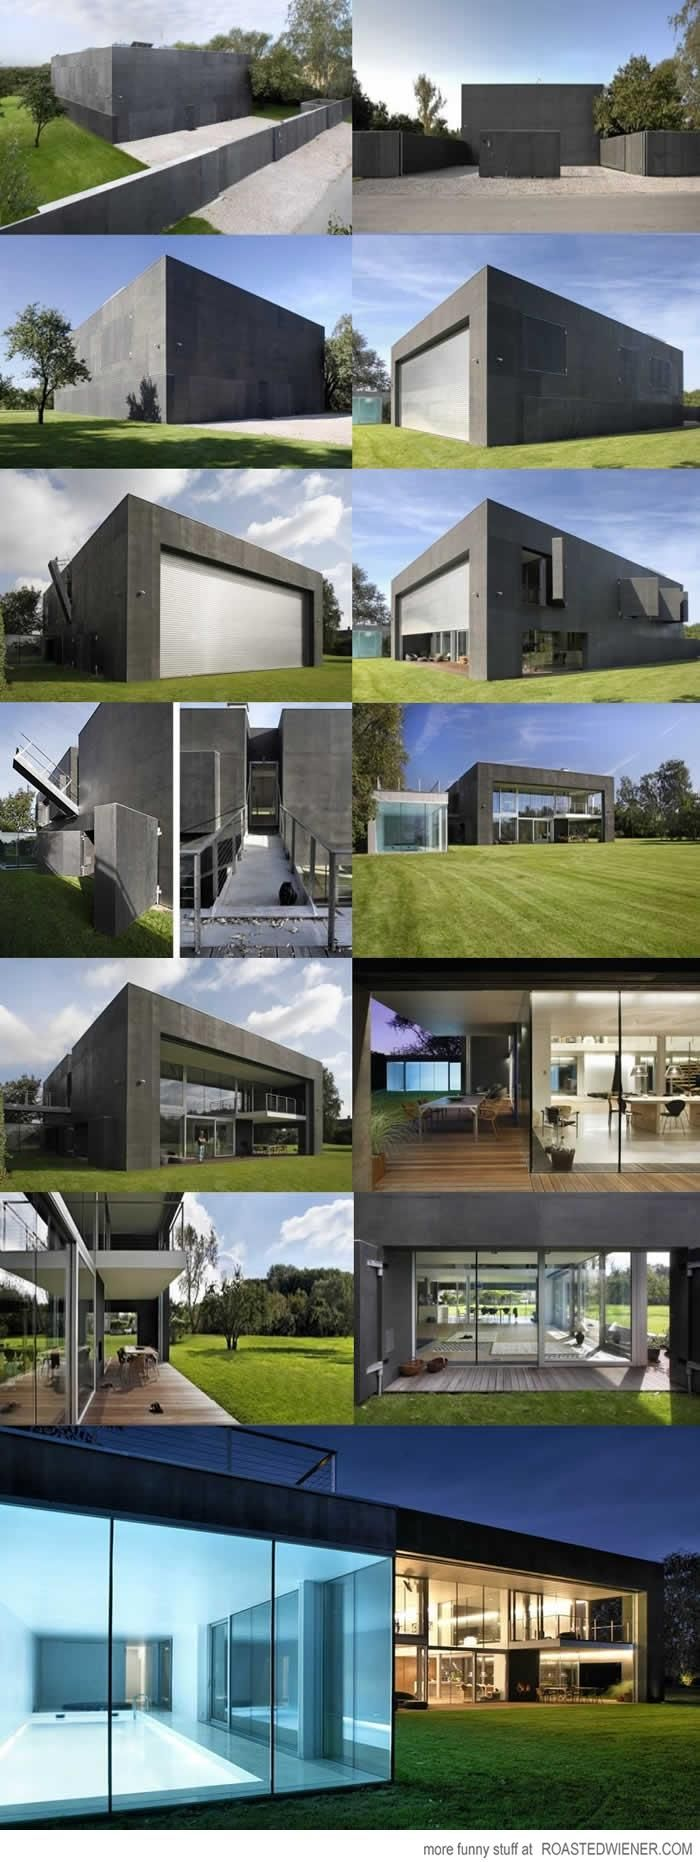 HOUSE READY FOR THE ZOMBIE APOCALYPSE | survival ... on earthquake home design, macabre home design, new mexico home design, old fashioned home design, monster home design, hurricane home design, hollywood home design,